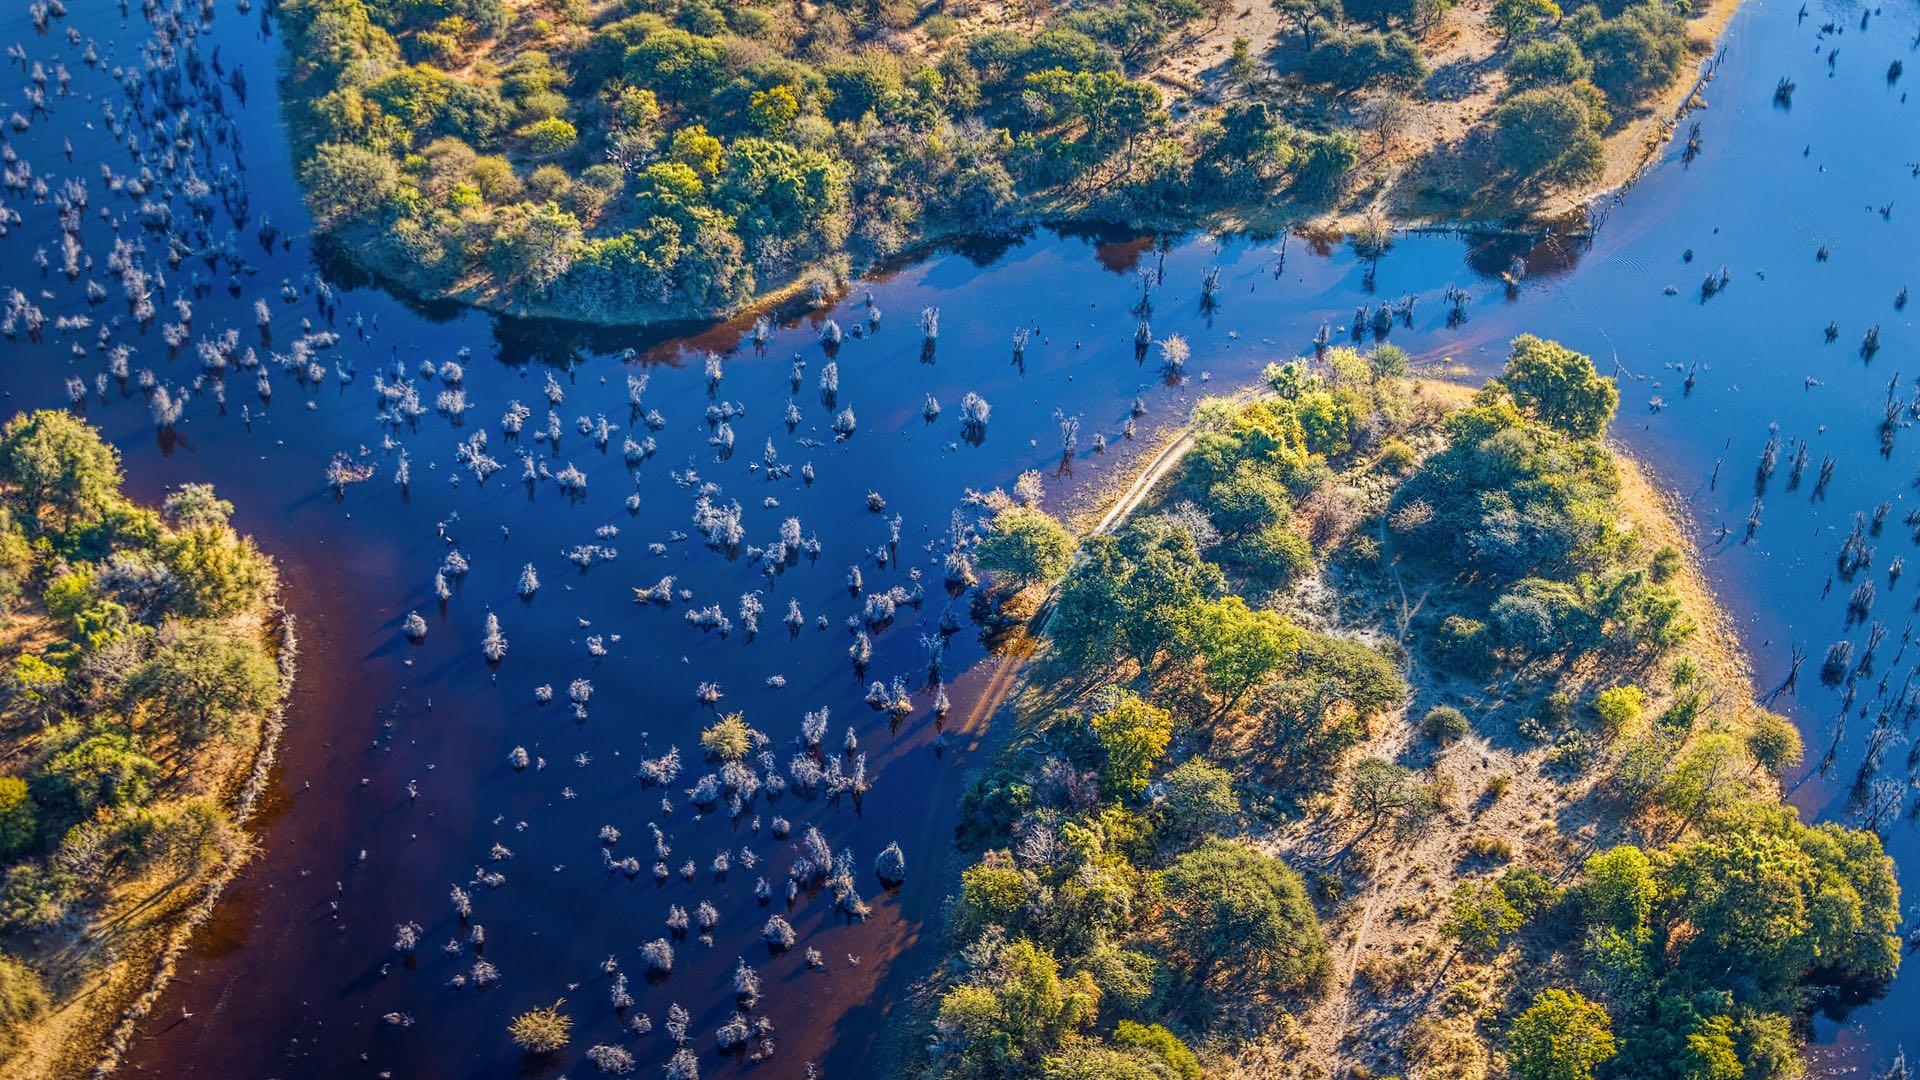 Südwestafrika| Botswana | ©Vadim Petrakov/shutterstock.com